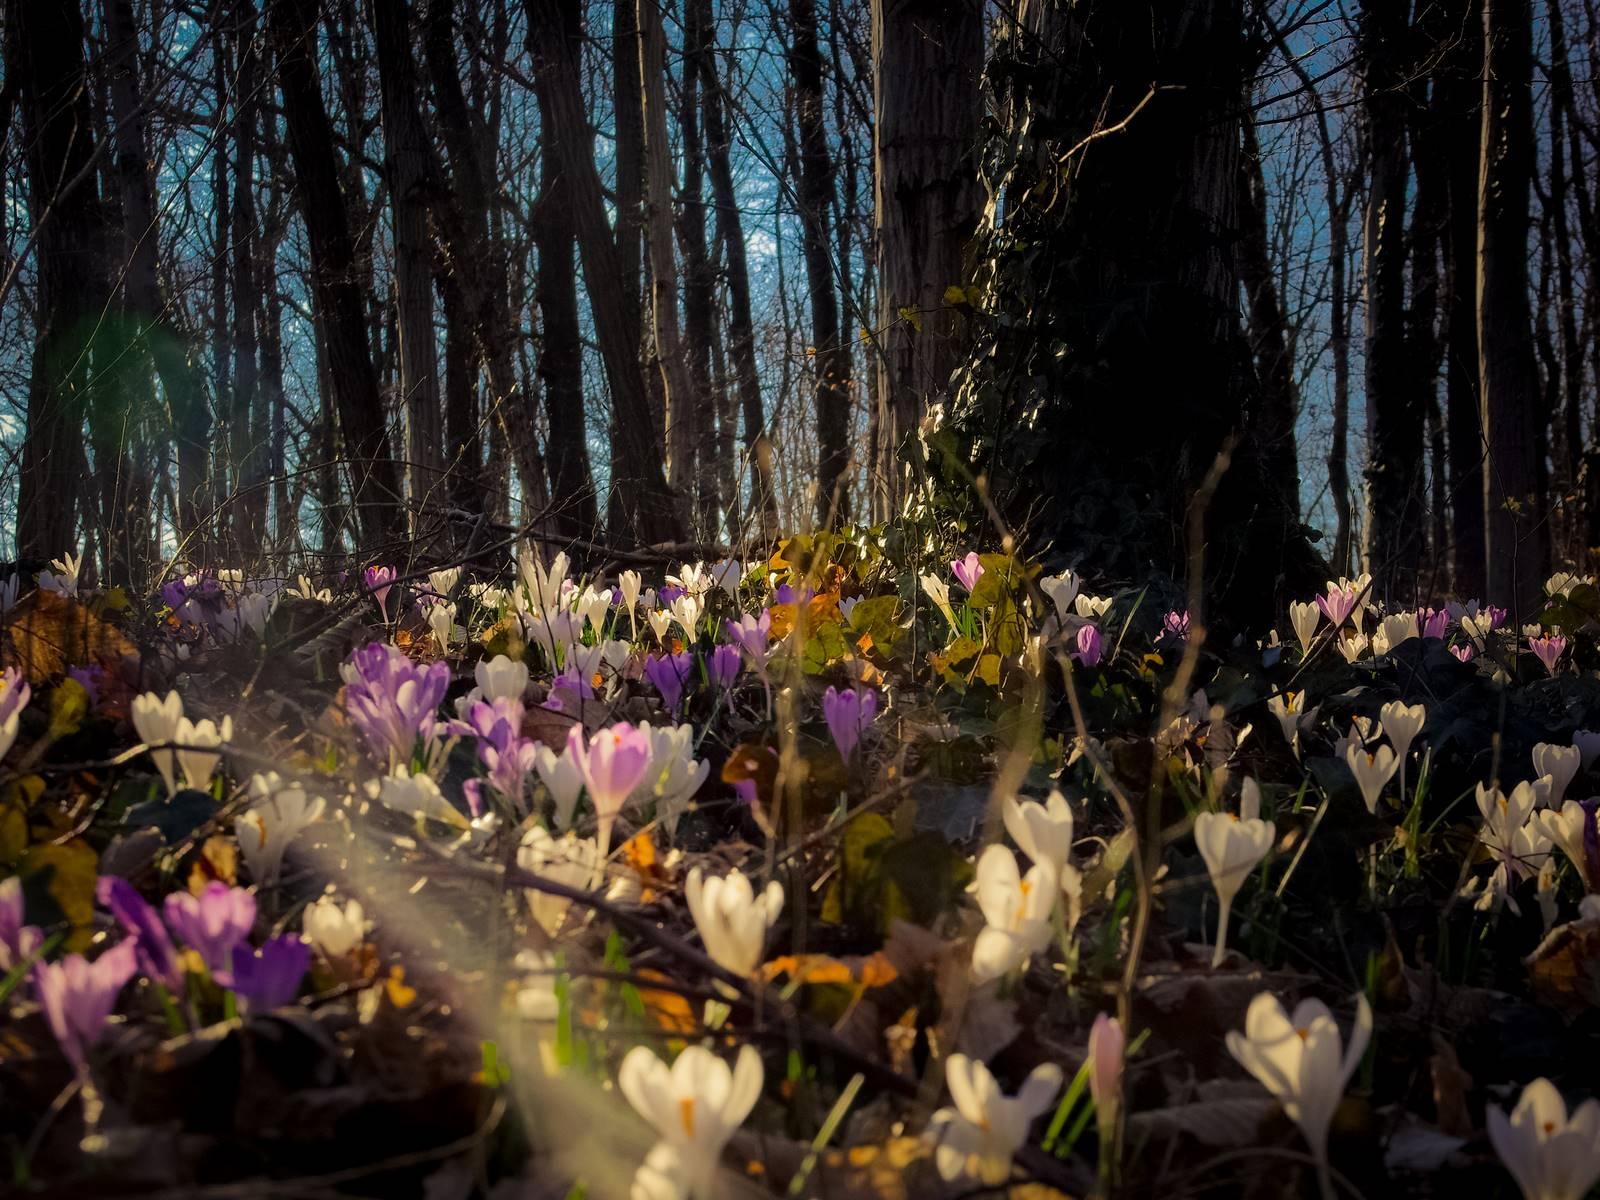 Bloomy spring time